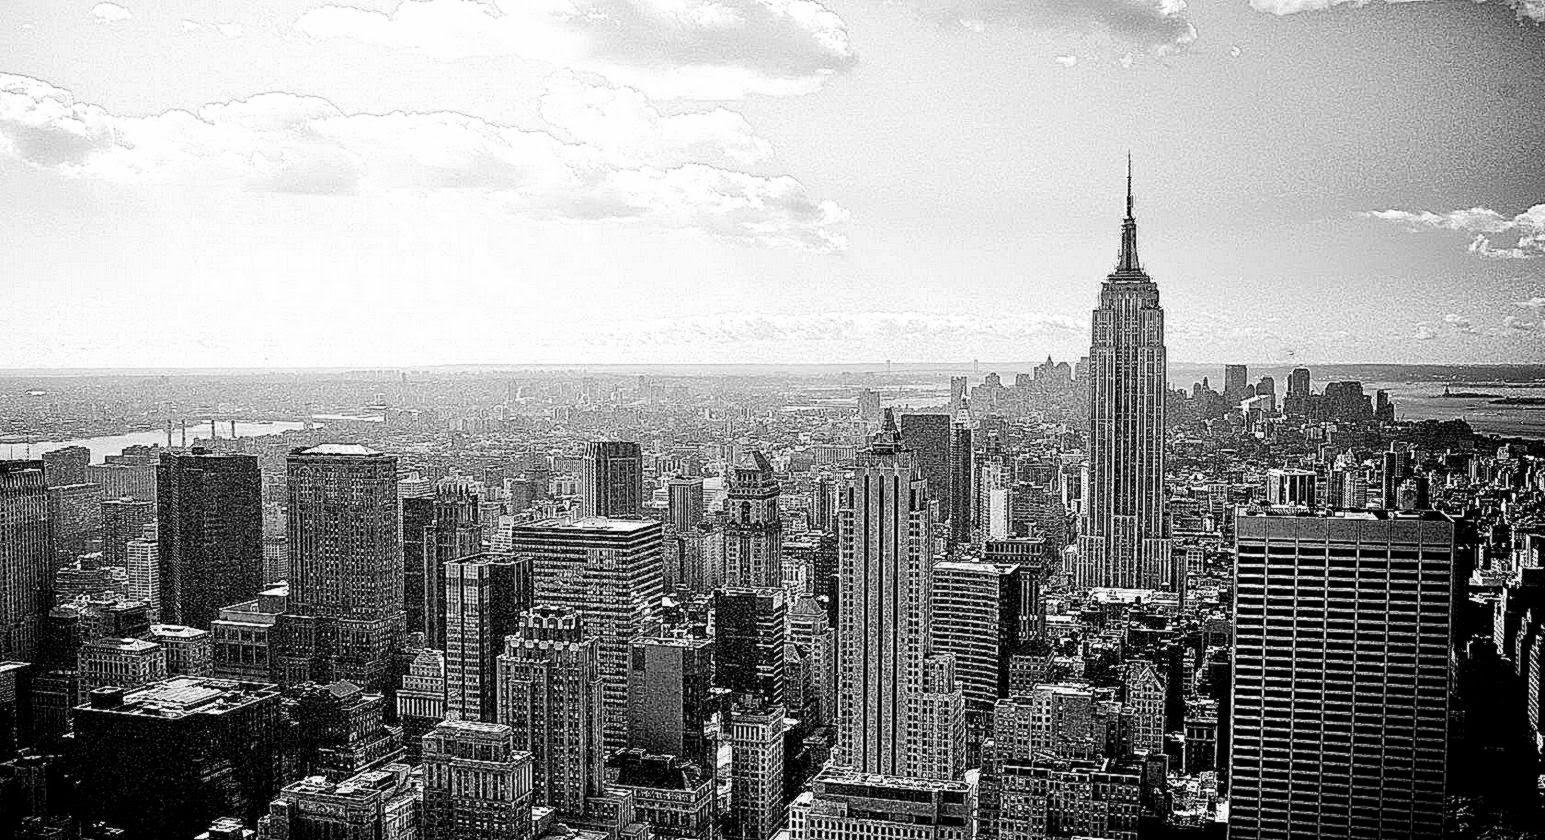 New York City Black And White Background Wallpaper Wallpaper 1545x840